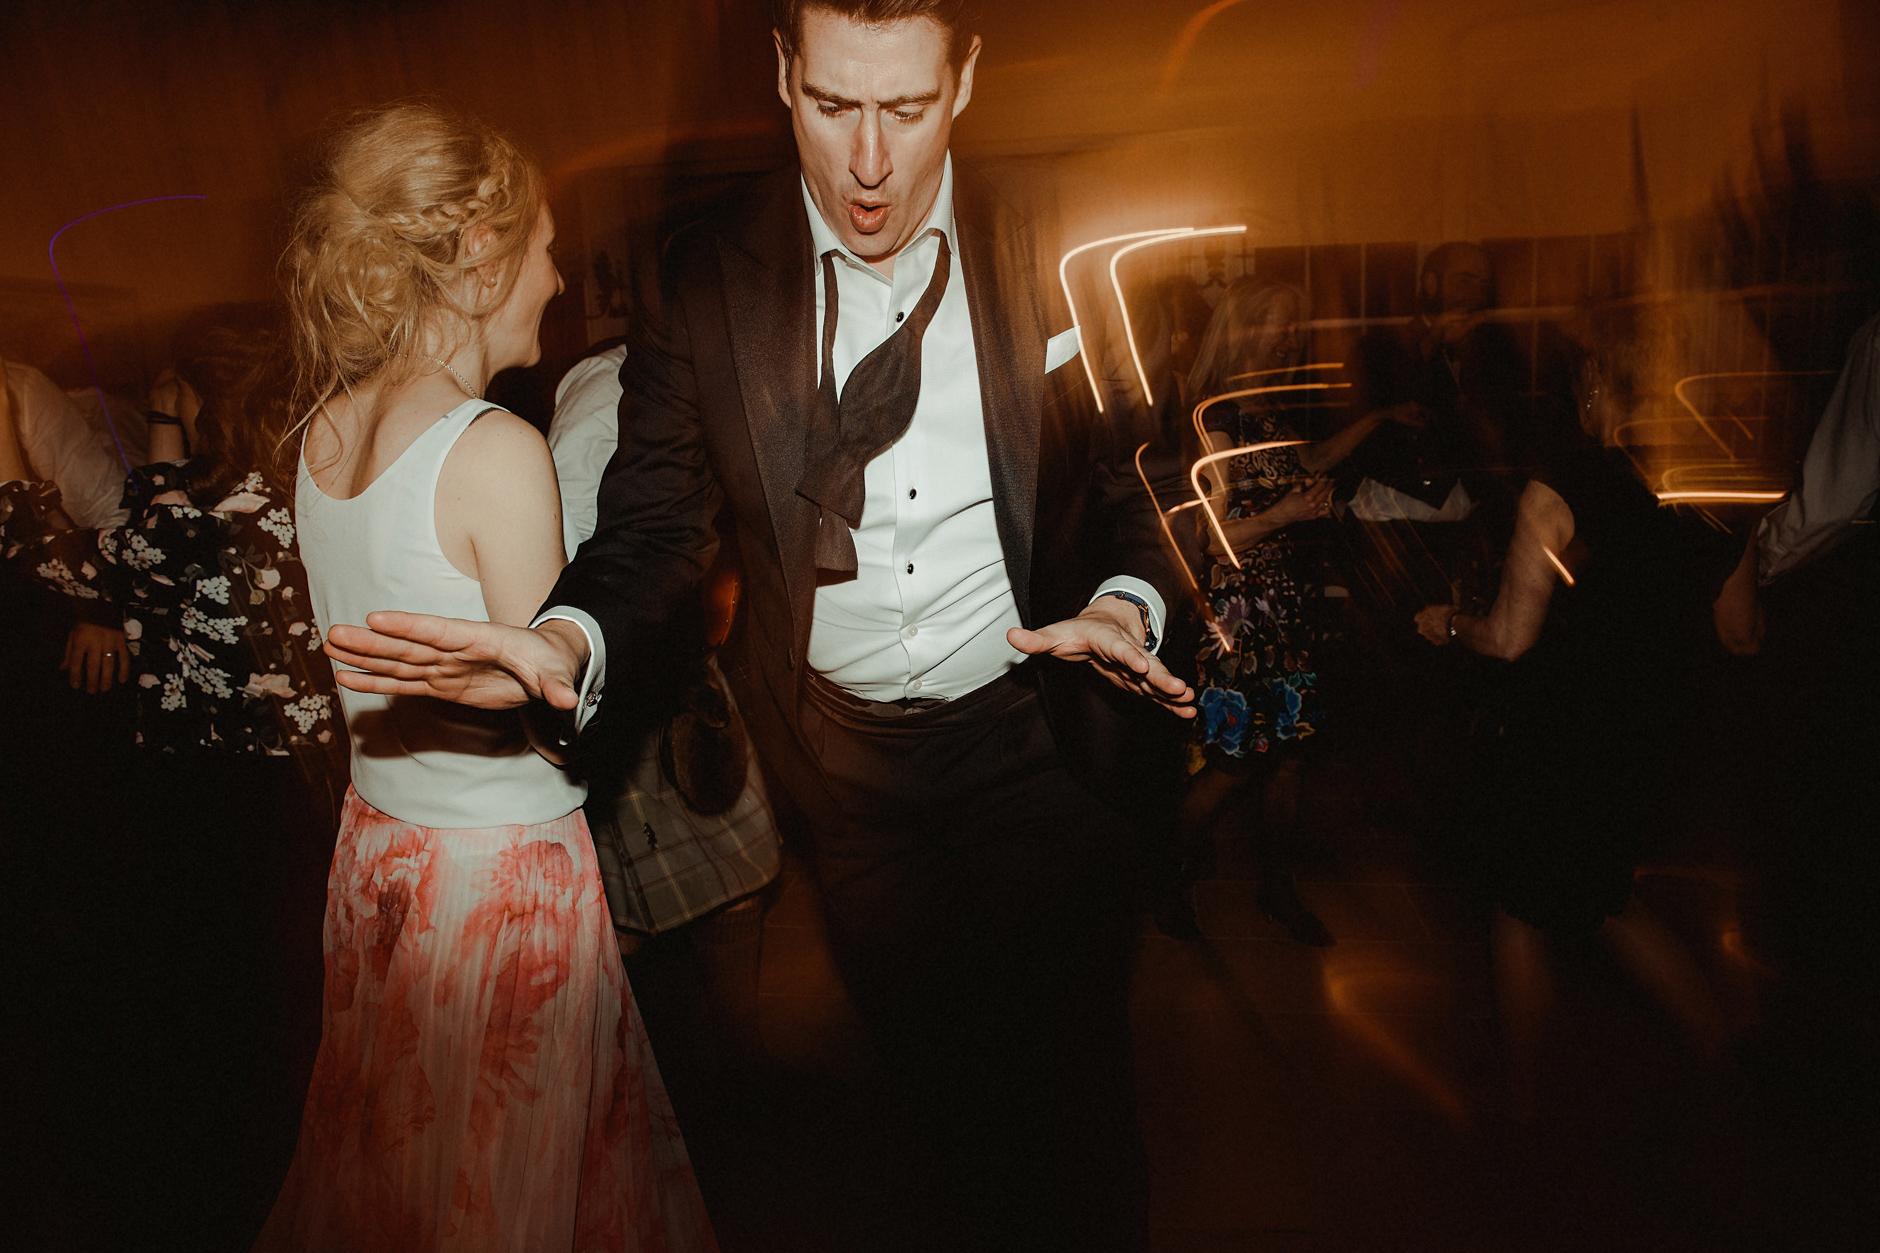 Glentruim-Wedding-Nikki-Leadbetter-Photography-409.jpg